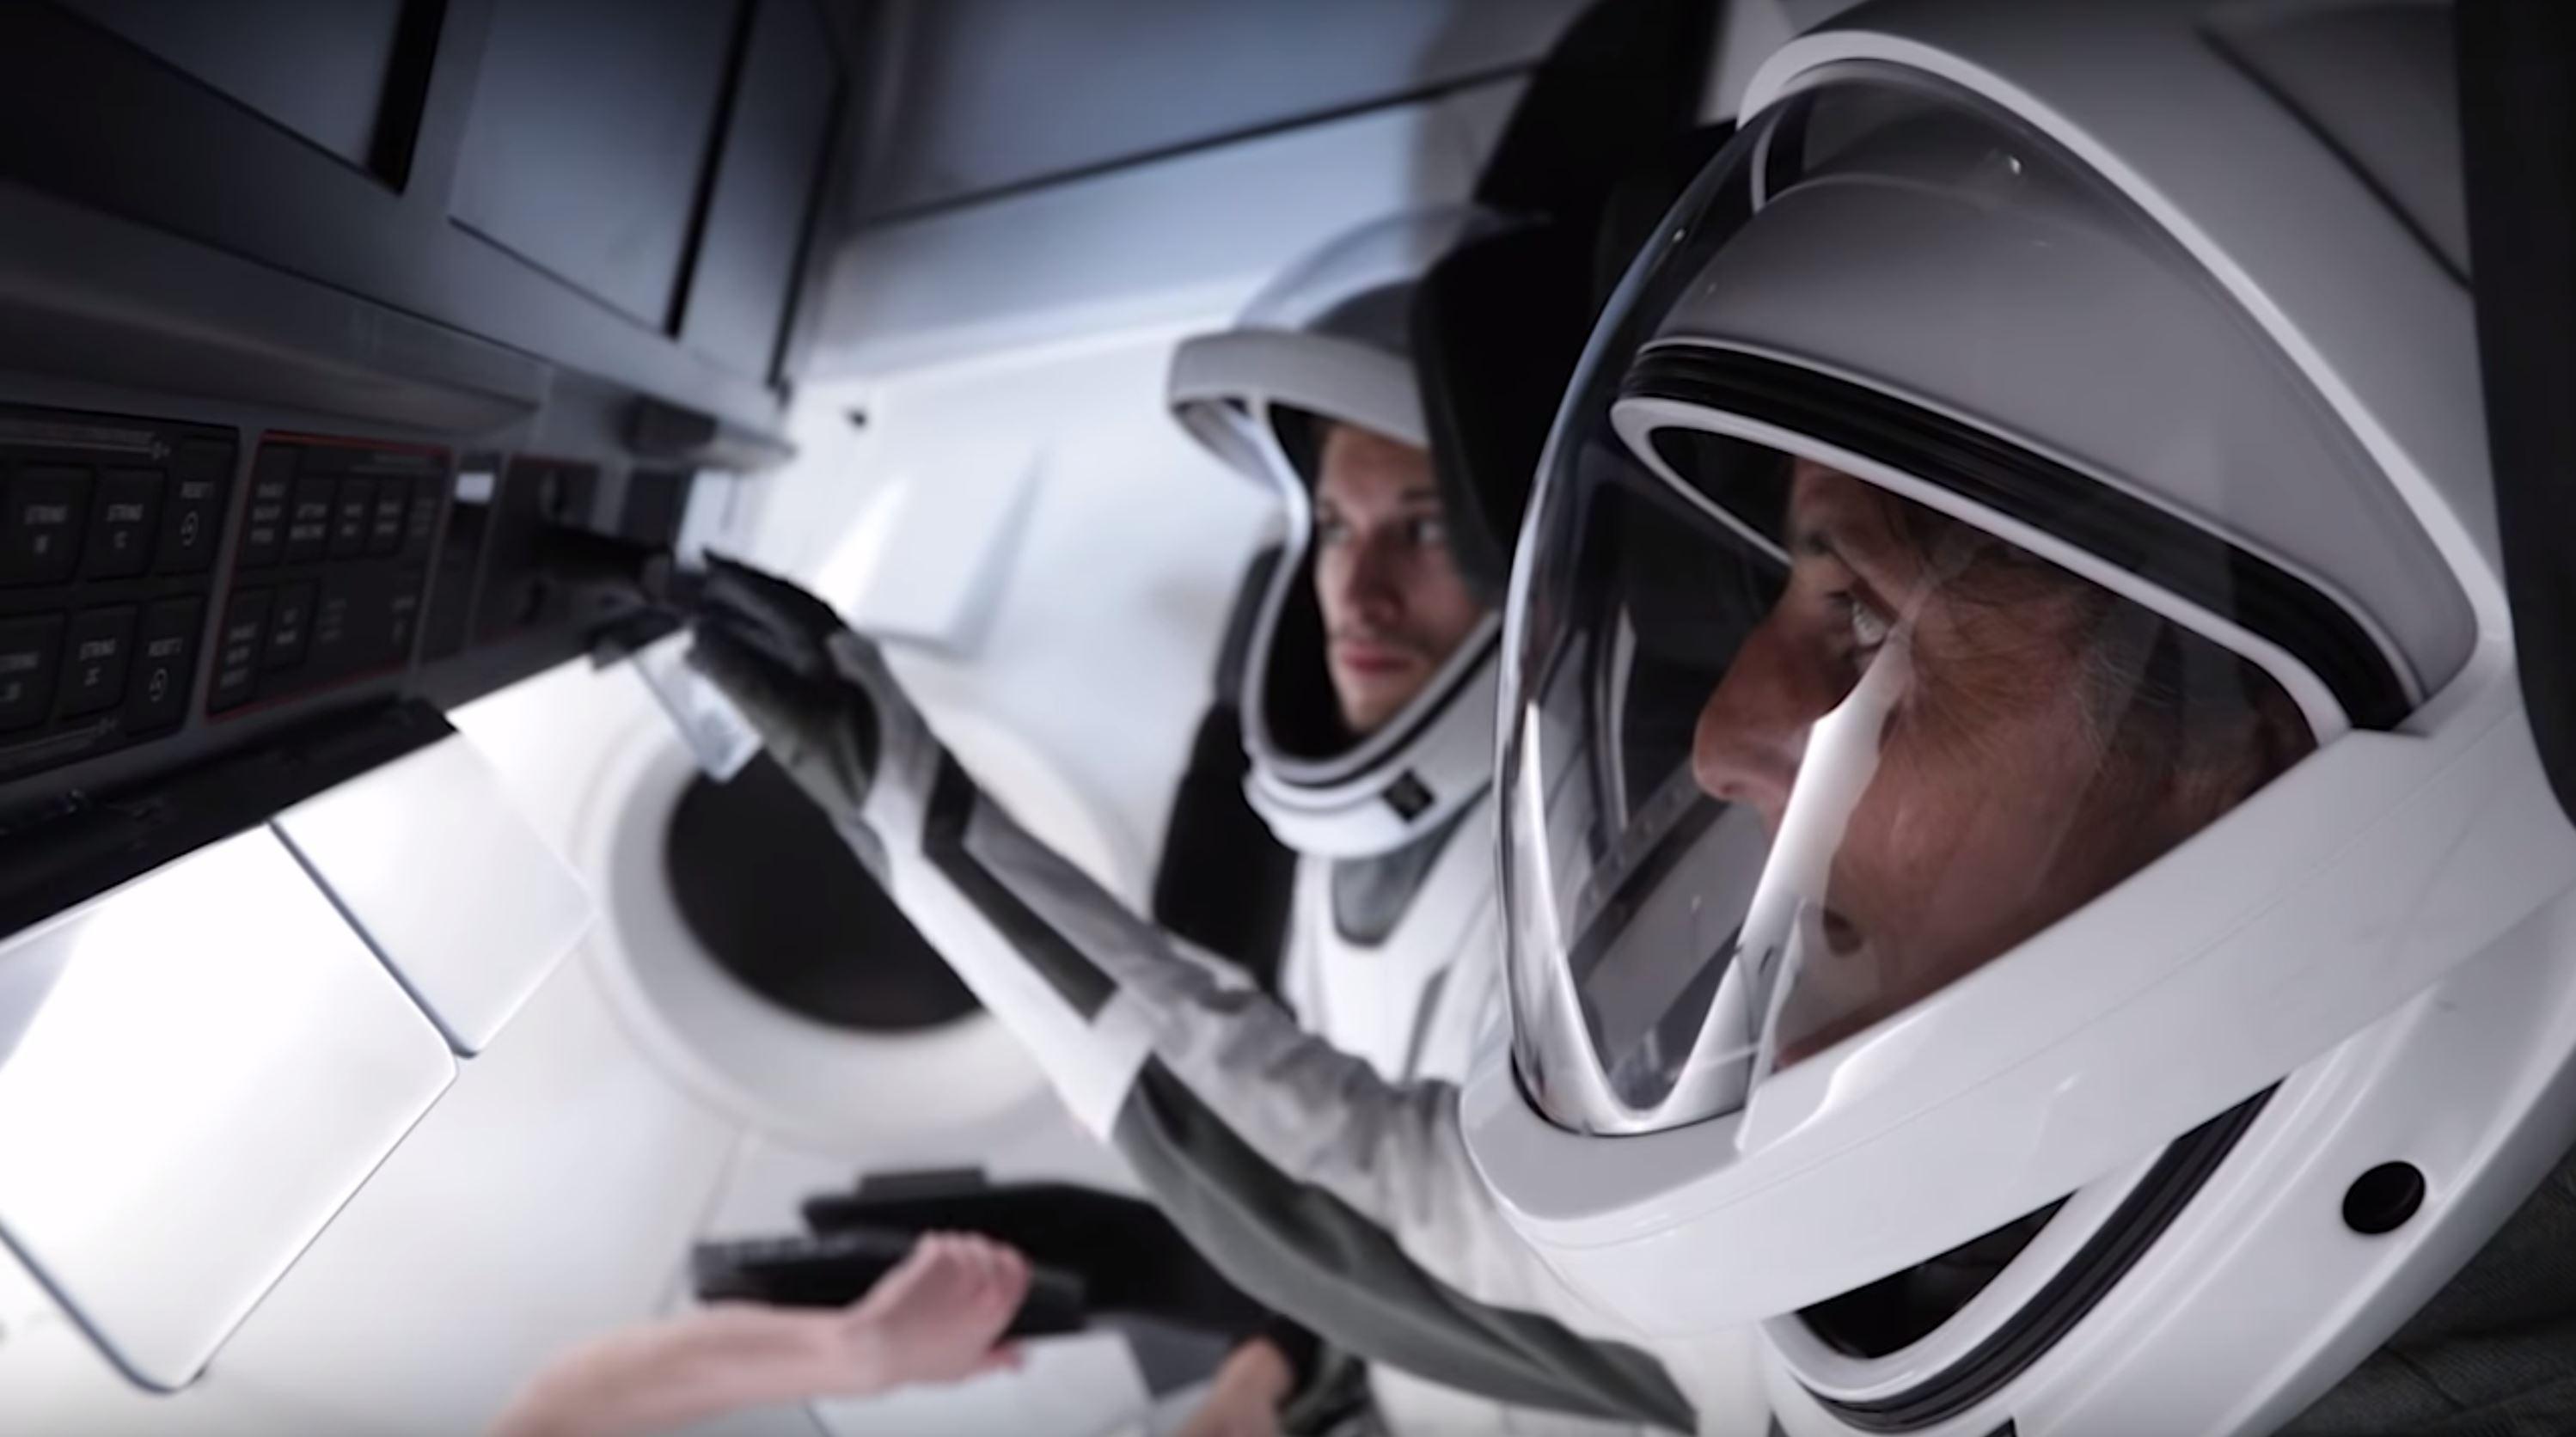 SpaceX spacesuit testing (SpaceX) 1